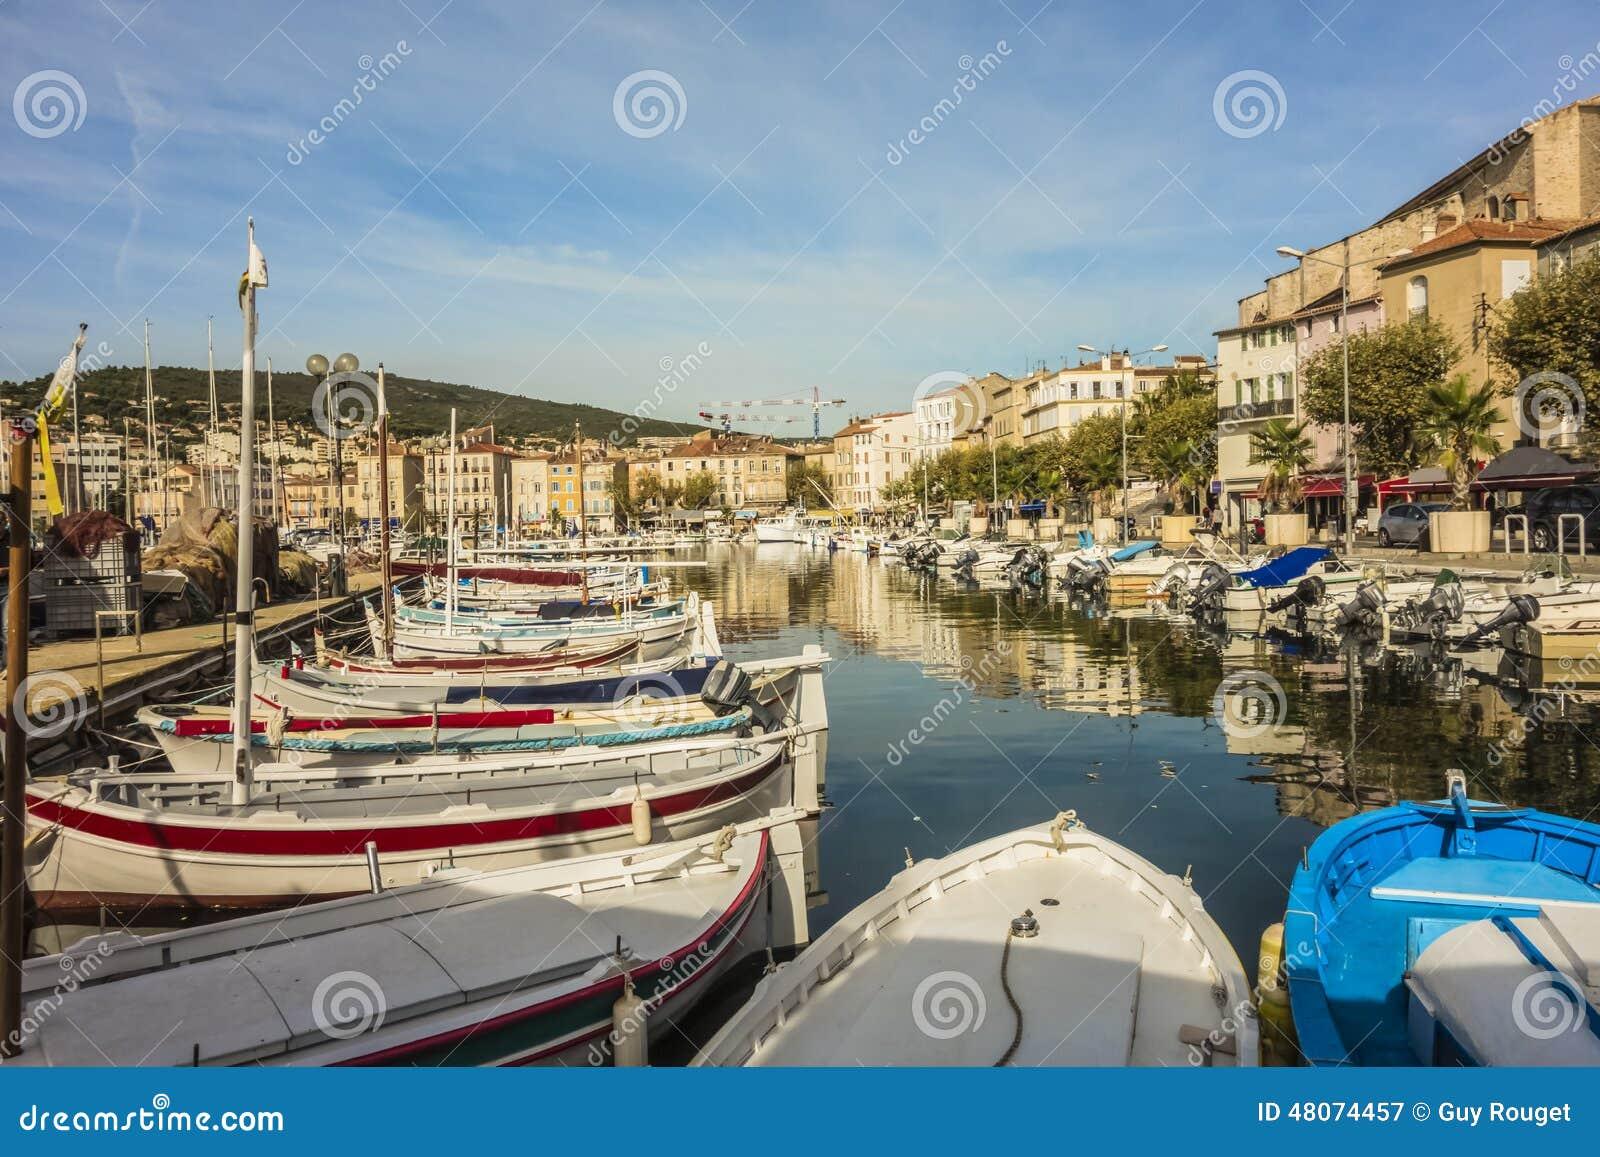 The port of la ciotat stock image image of naval dinghy 48074457 - Restaurant port la ciotat ...